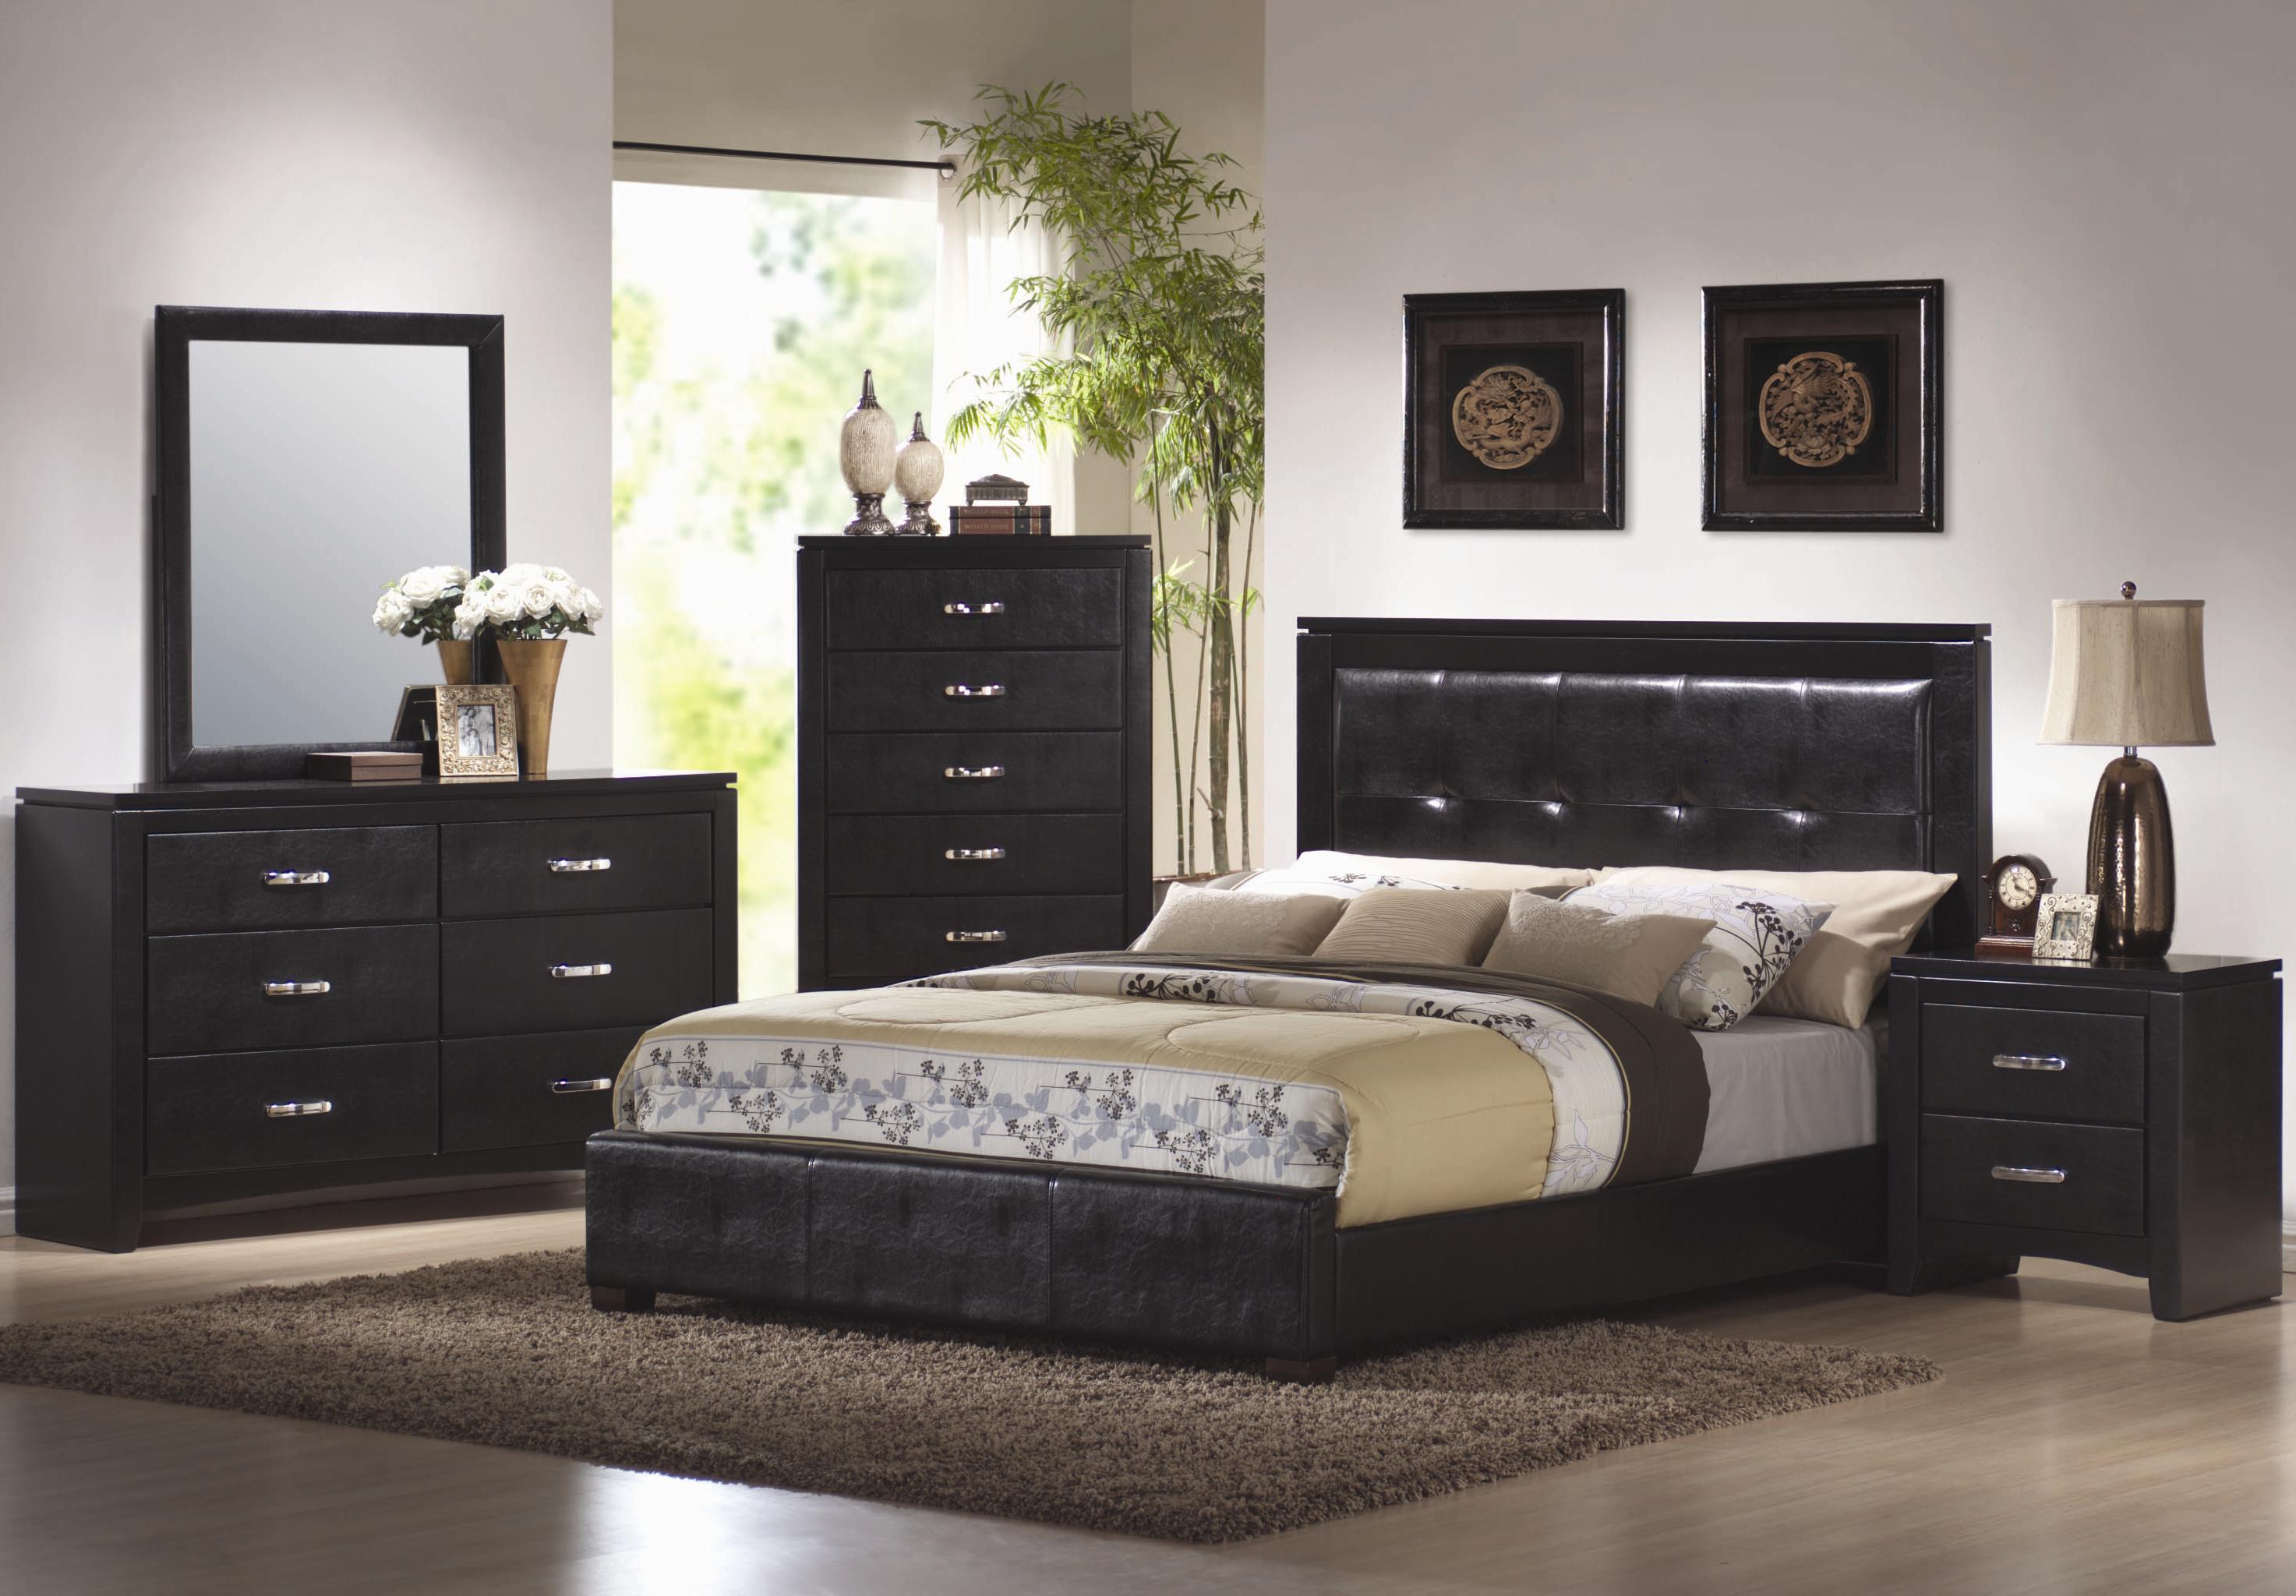 Coaster Dylan Queen Bedroom Group - Item Number: 201400 Q Bedroom Group 1